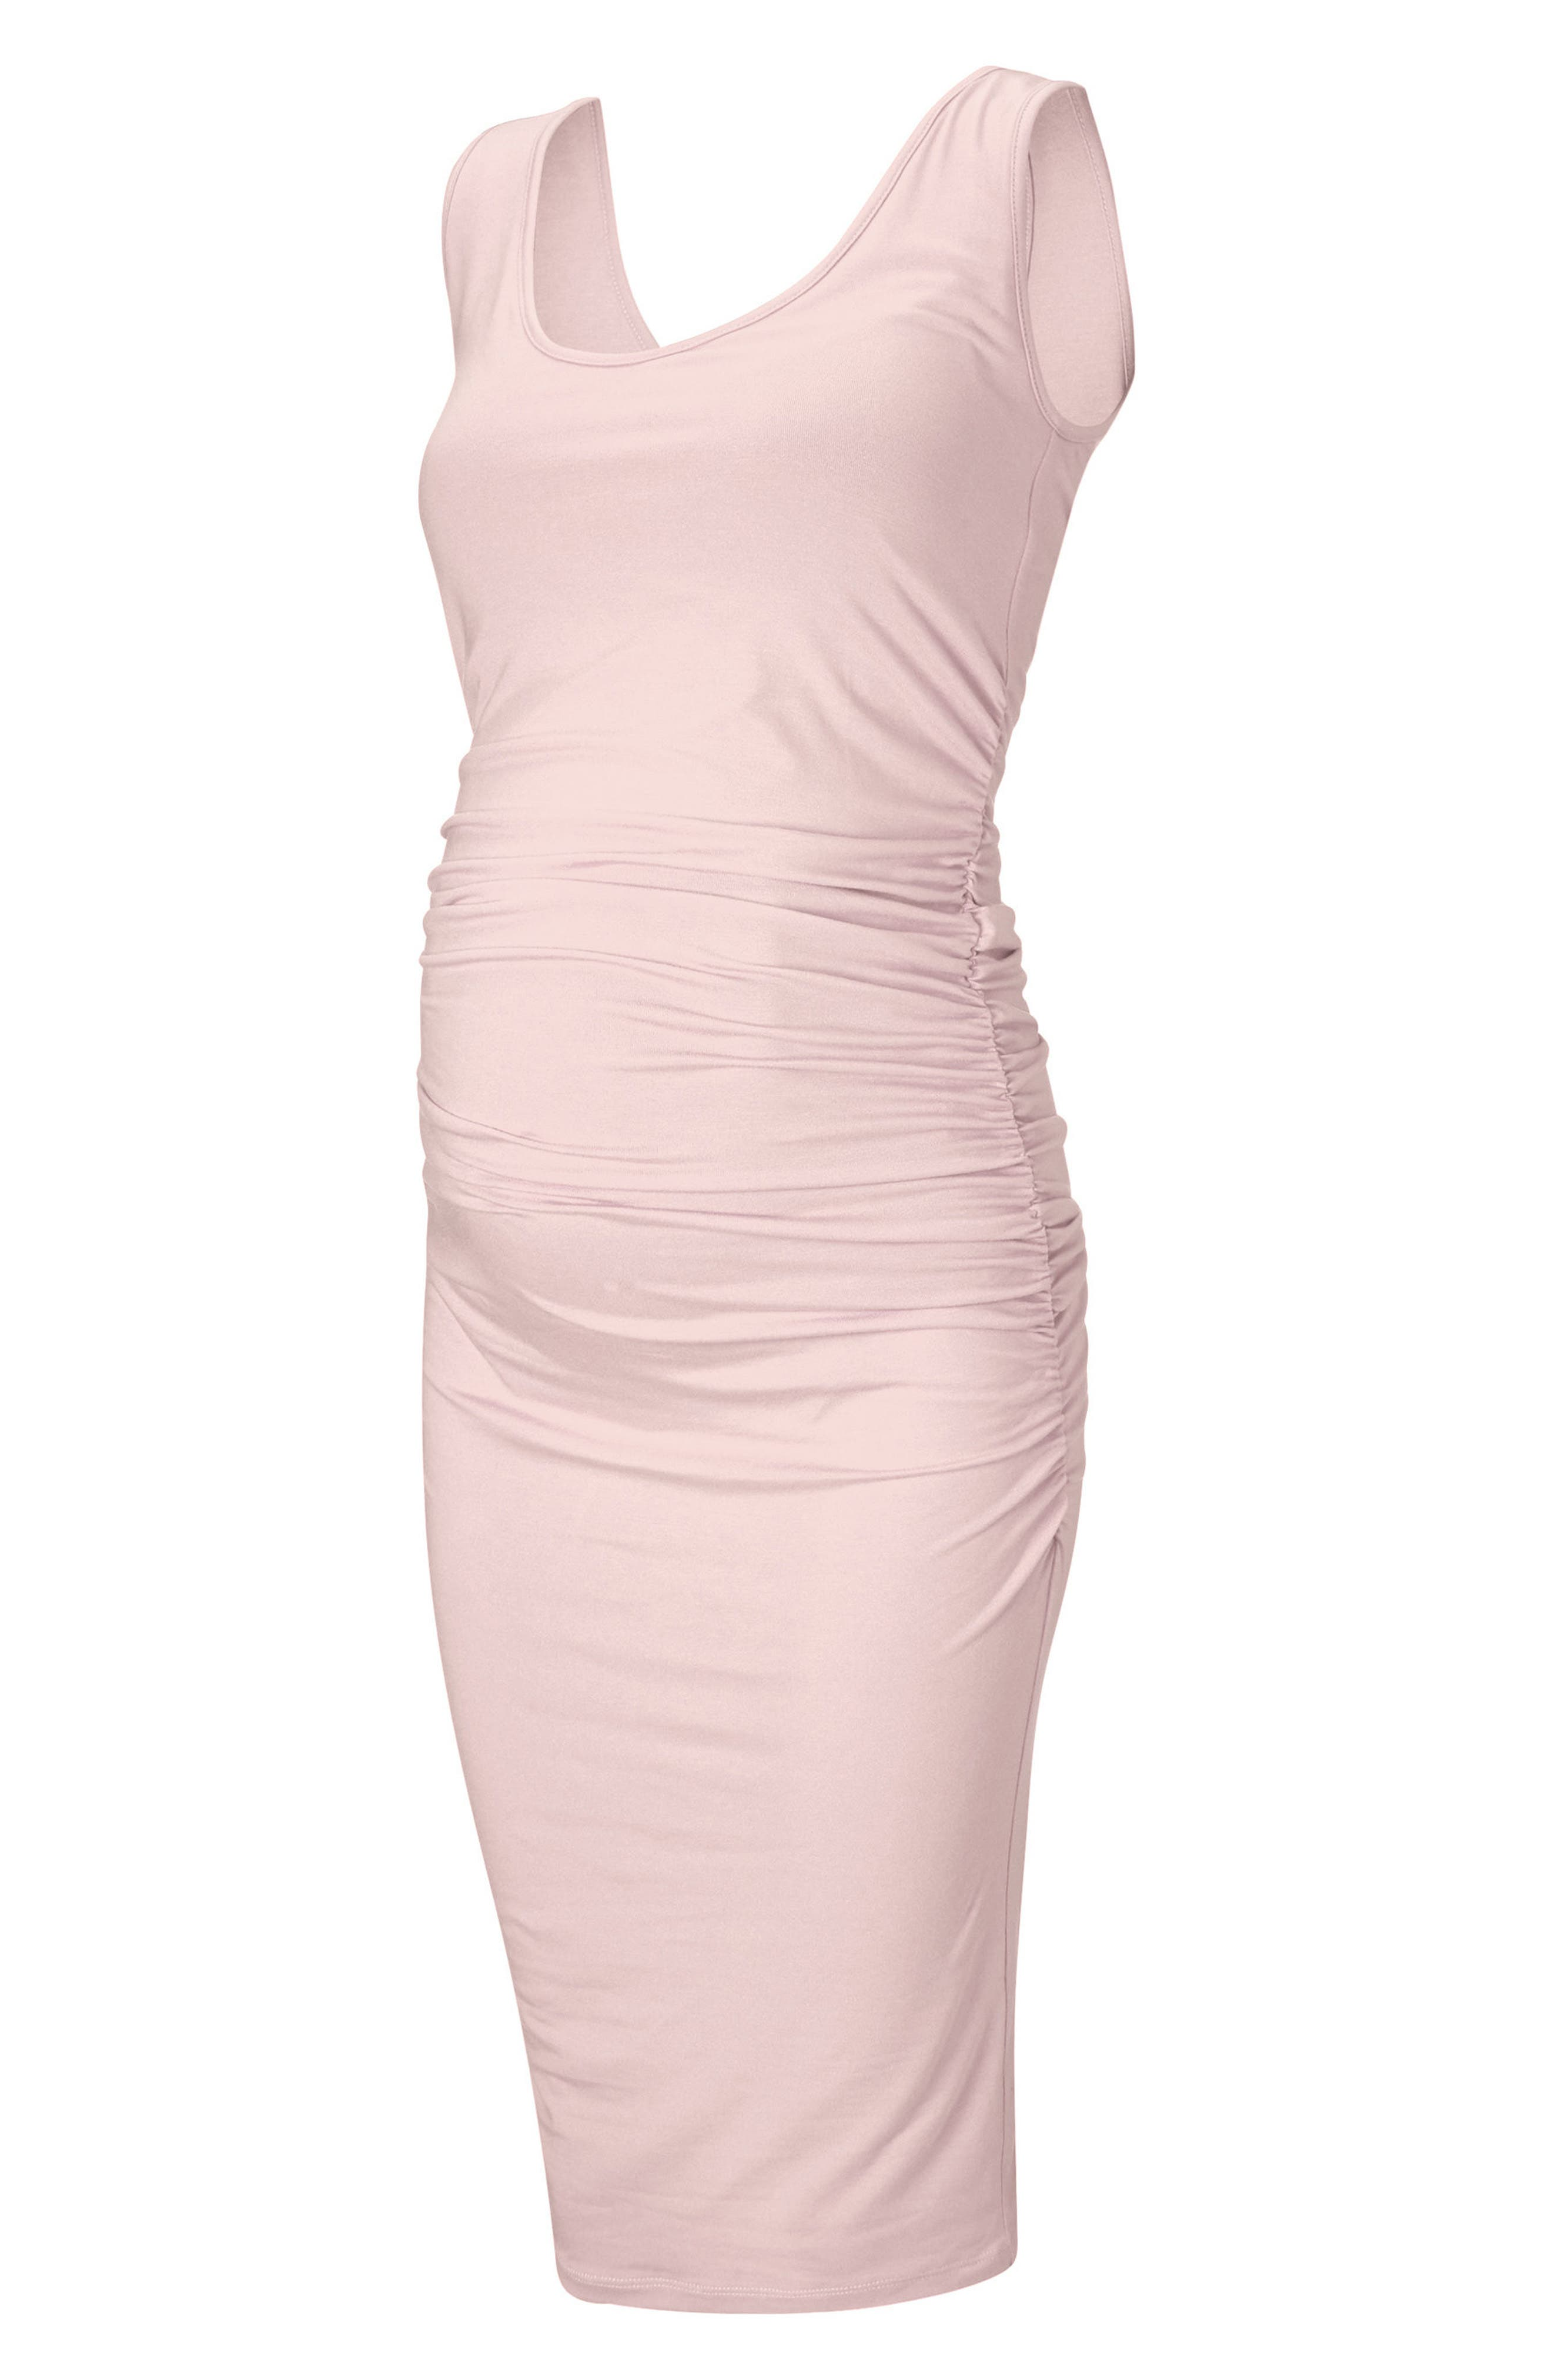 'Ellis' Side Ruched Maternity Tank Dress,                         Main,                         color, Cloud Pink